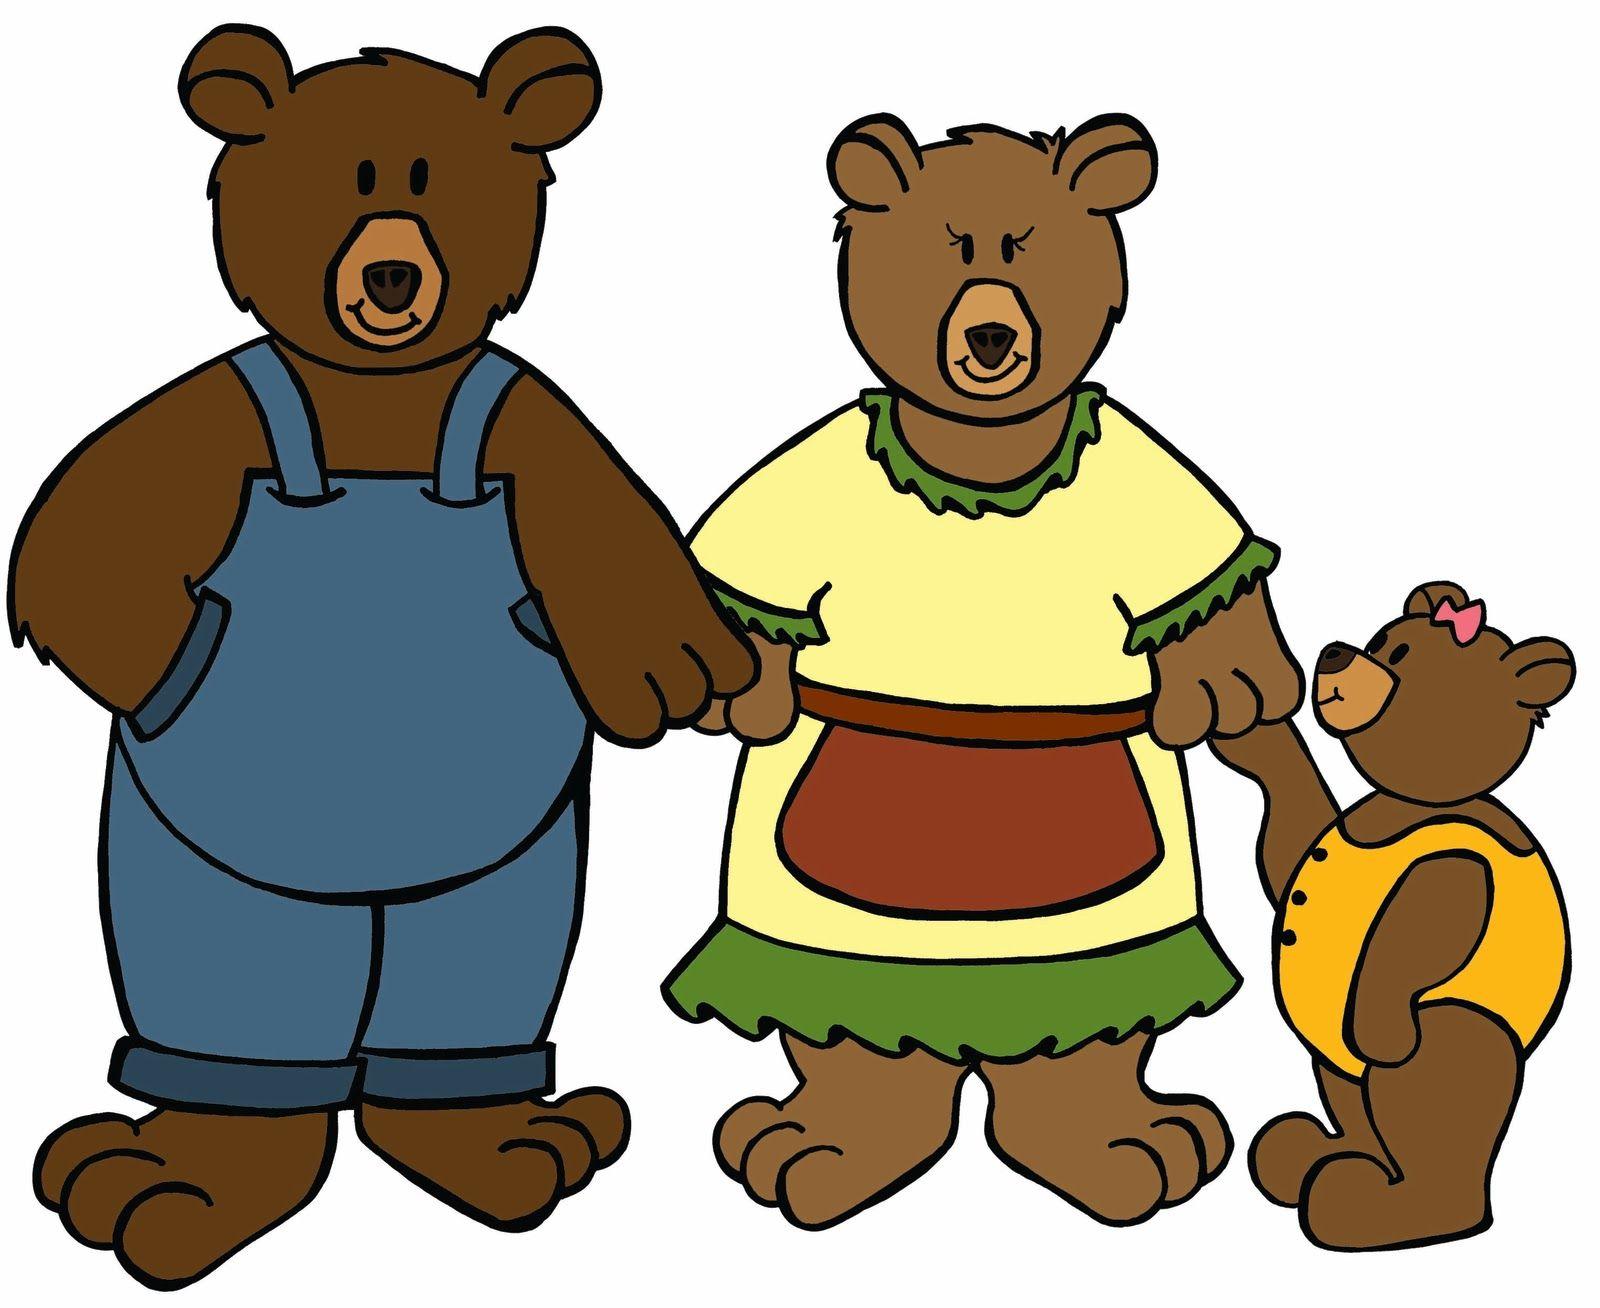 Goldilocks And The Three Bears Clipart At Getdrawings